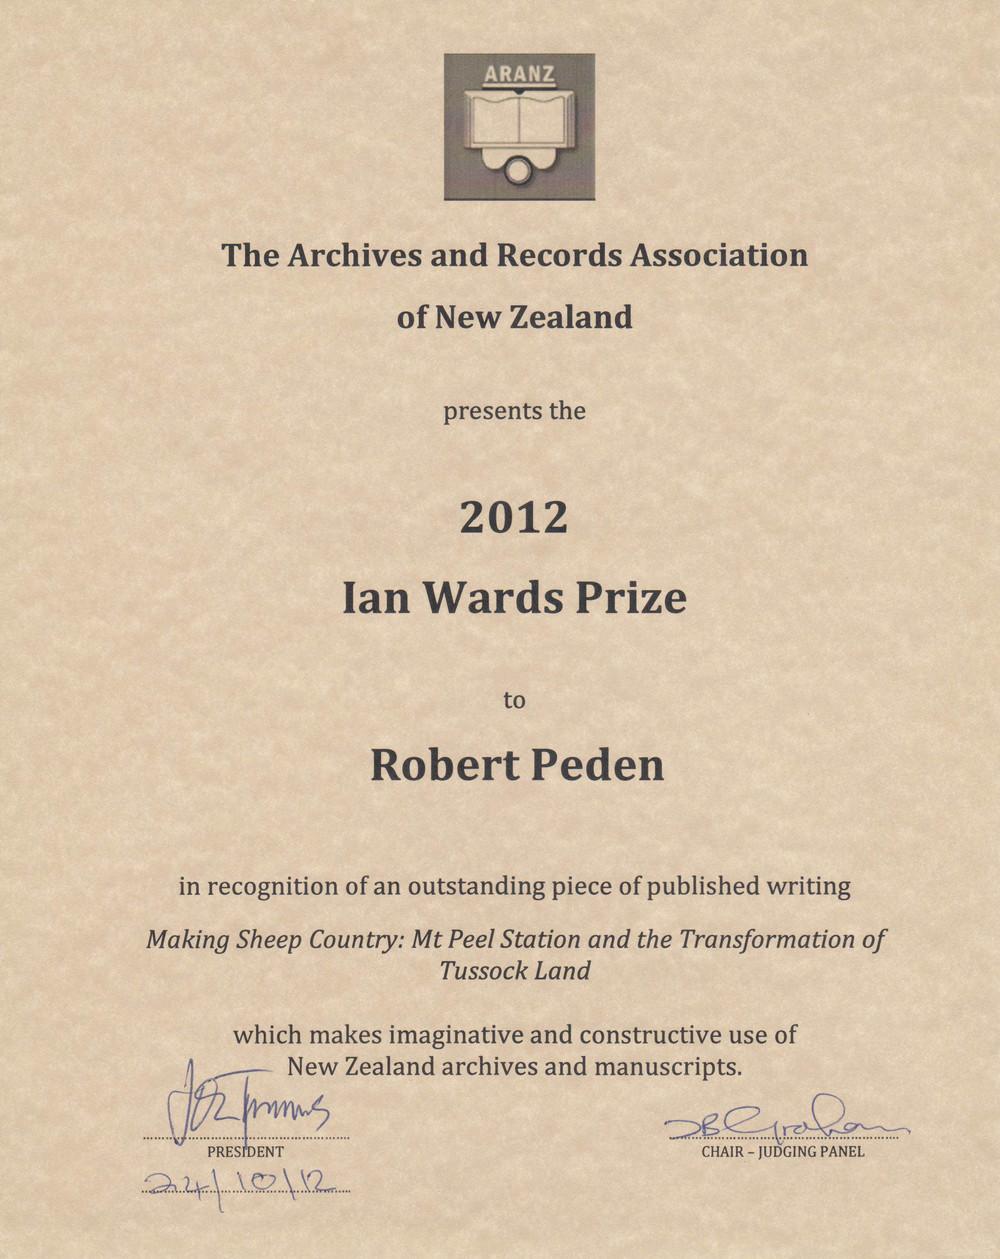 ian-wards-prize.jpg